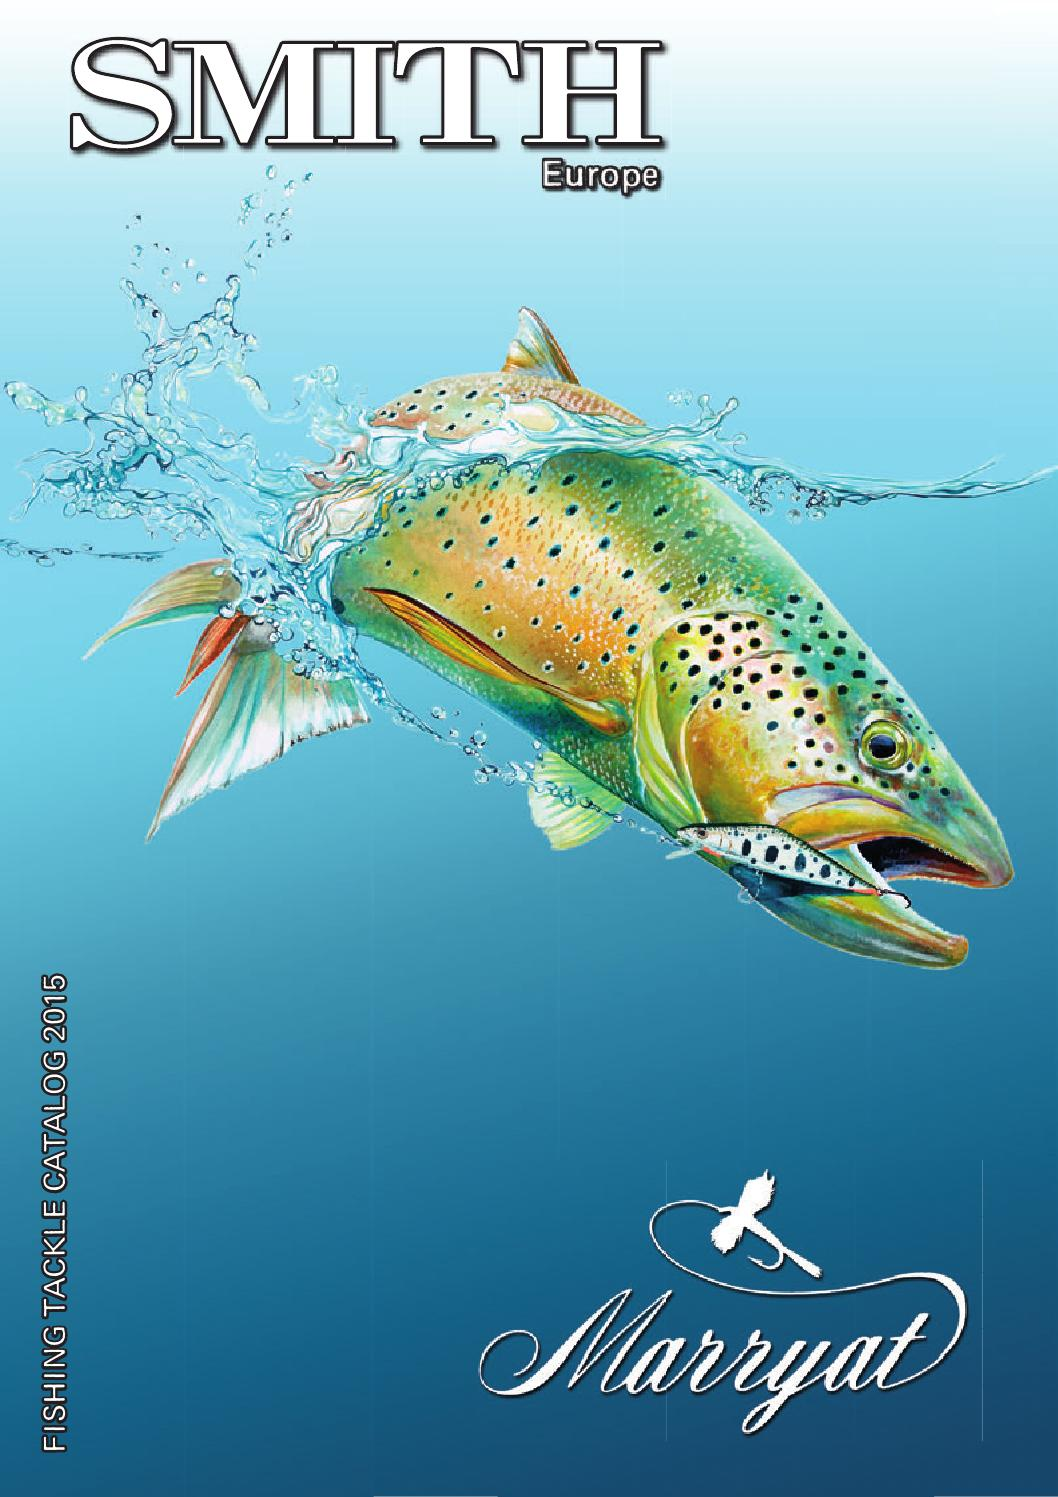 MORT NOIRE fly 6 mouches Fly Fishing Flies Tarpon, Sébaste, truite, Snook